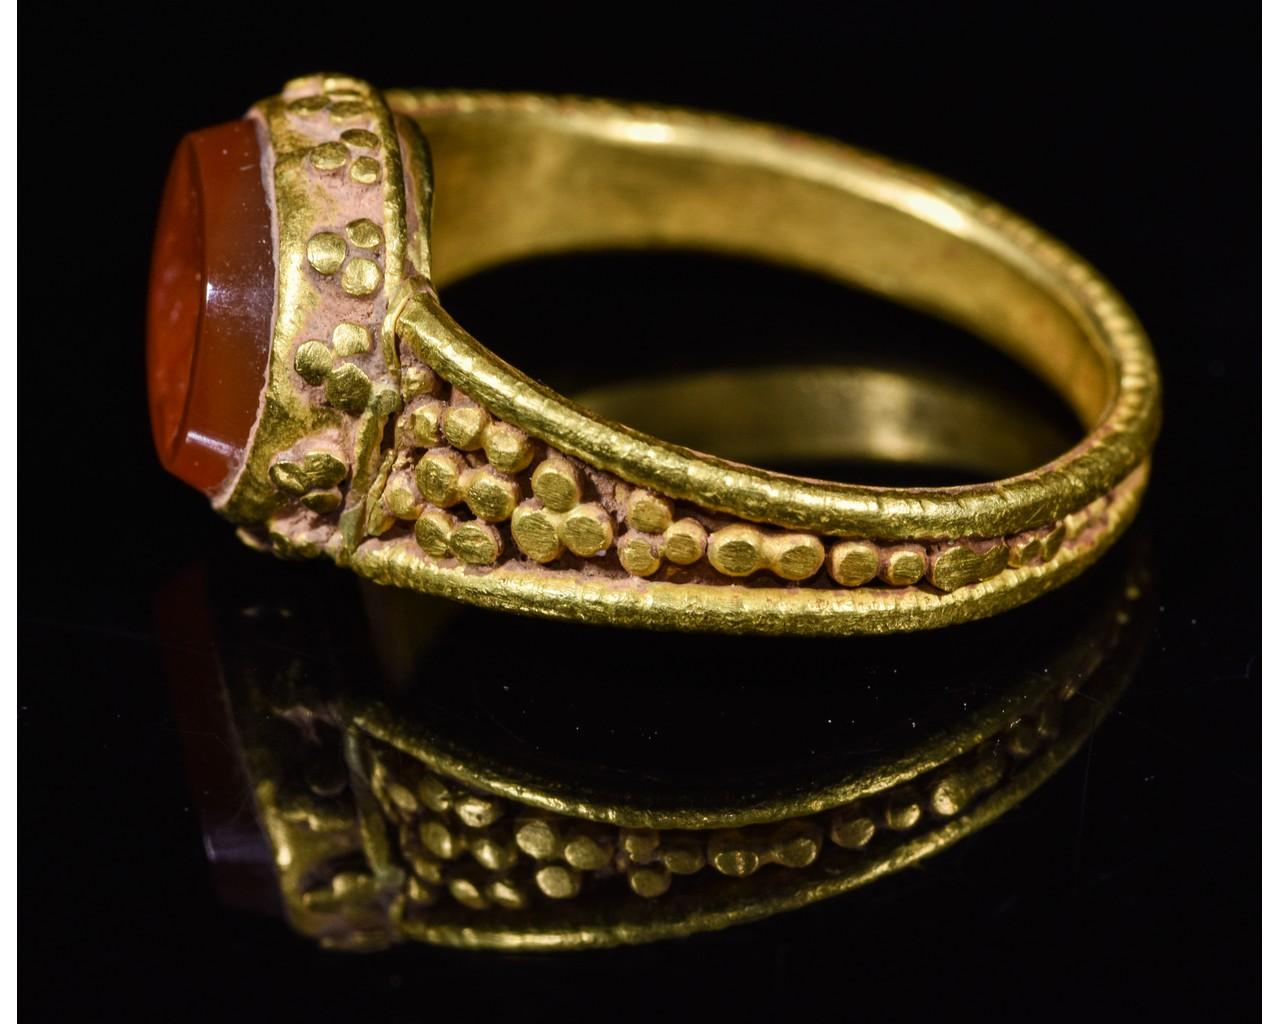 Lot 3 - ROMAN GOLD INTAGLIO RING WITH JULIAN II THE APOSTATE